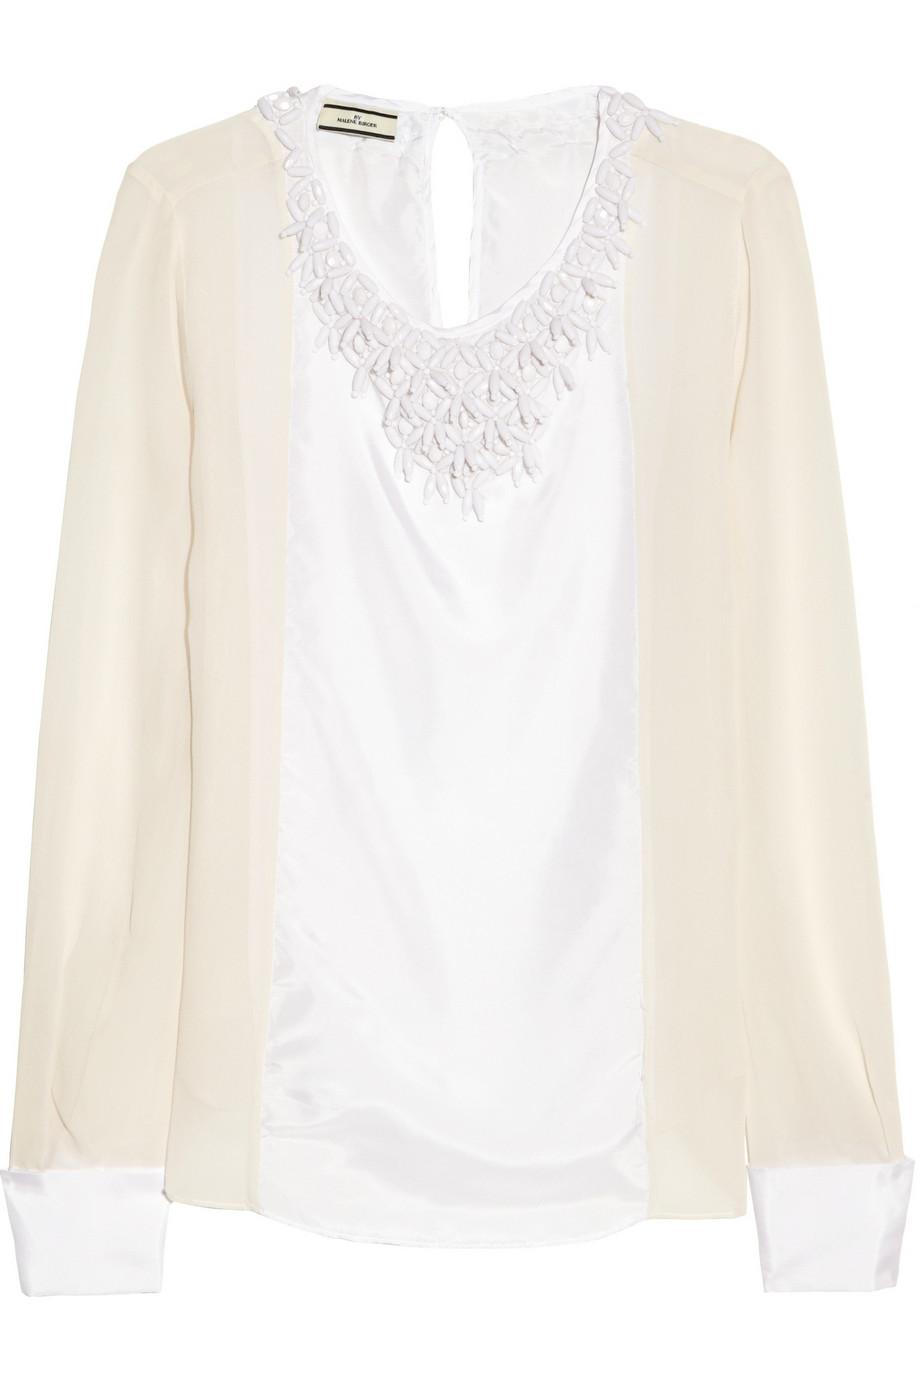 Cenila beaded silk-satin and chiffon blouse | THE OUTNET